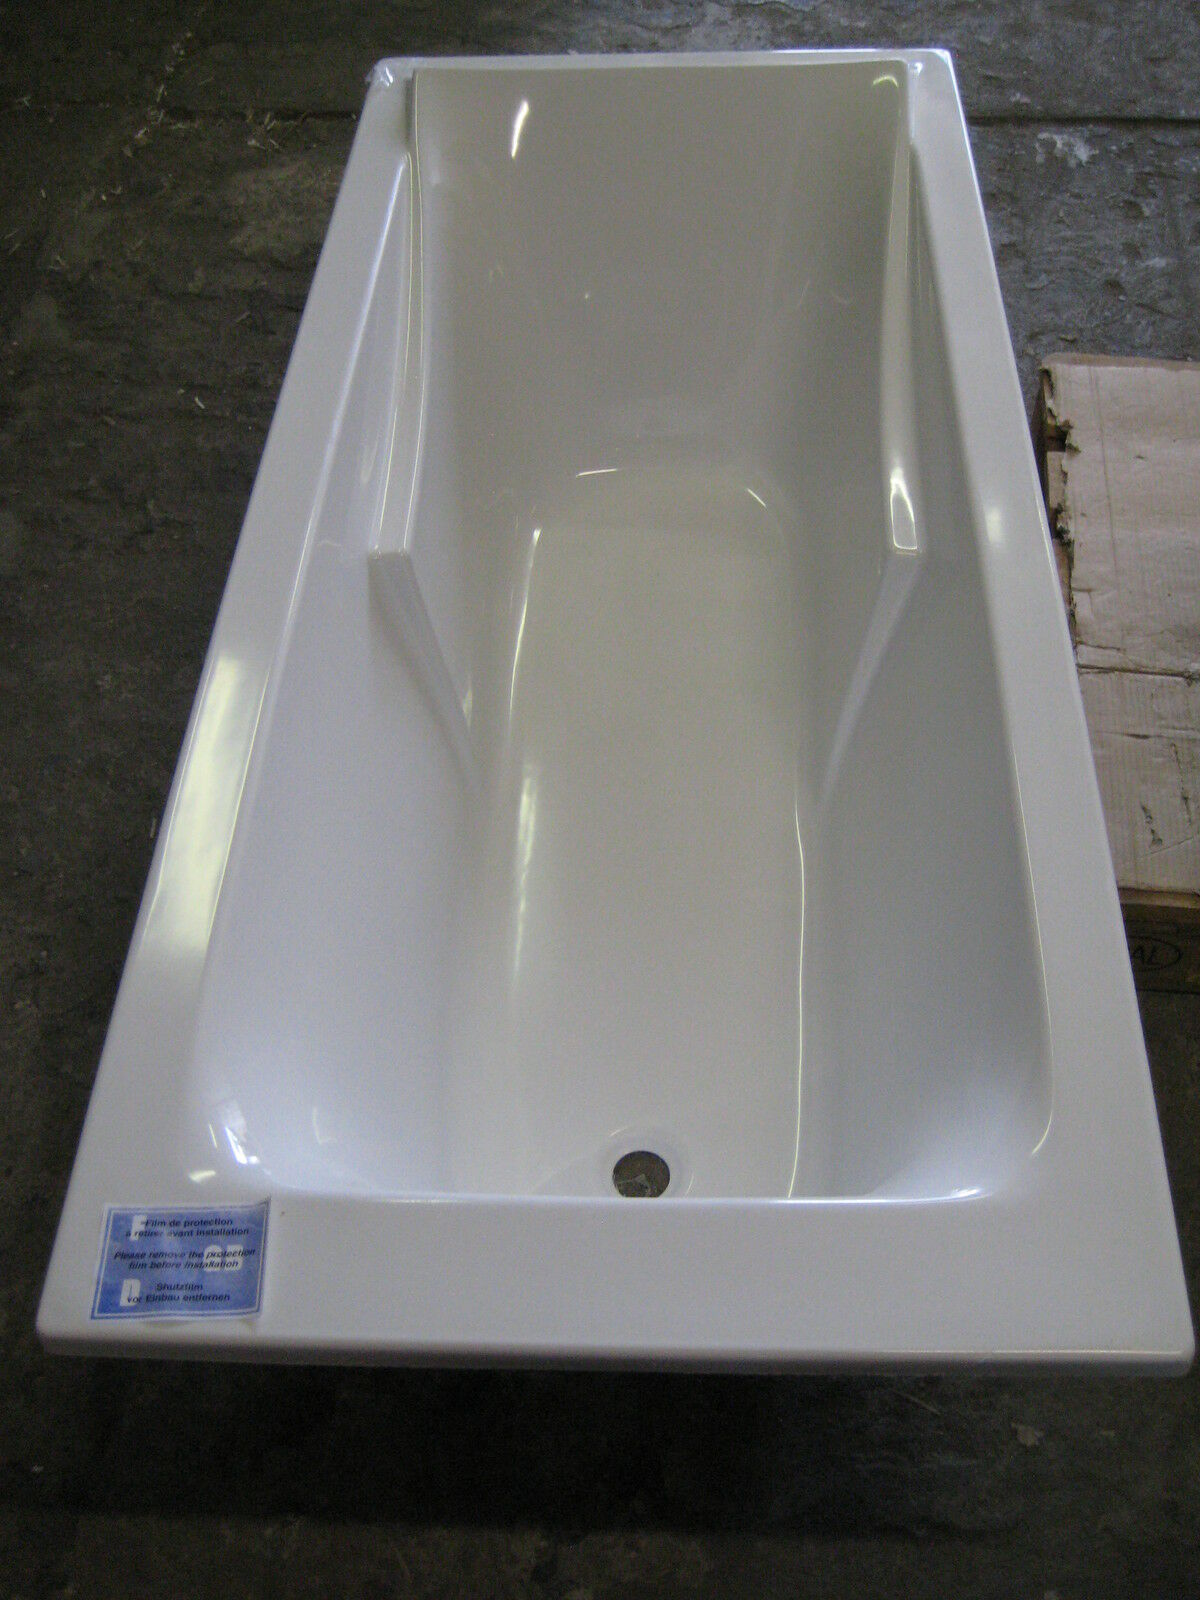 Körperform-Badewanne 170x75cm, Serie Corvette3, Artikel 60901-00  Badewanne NEU